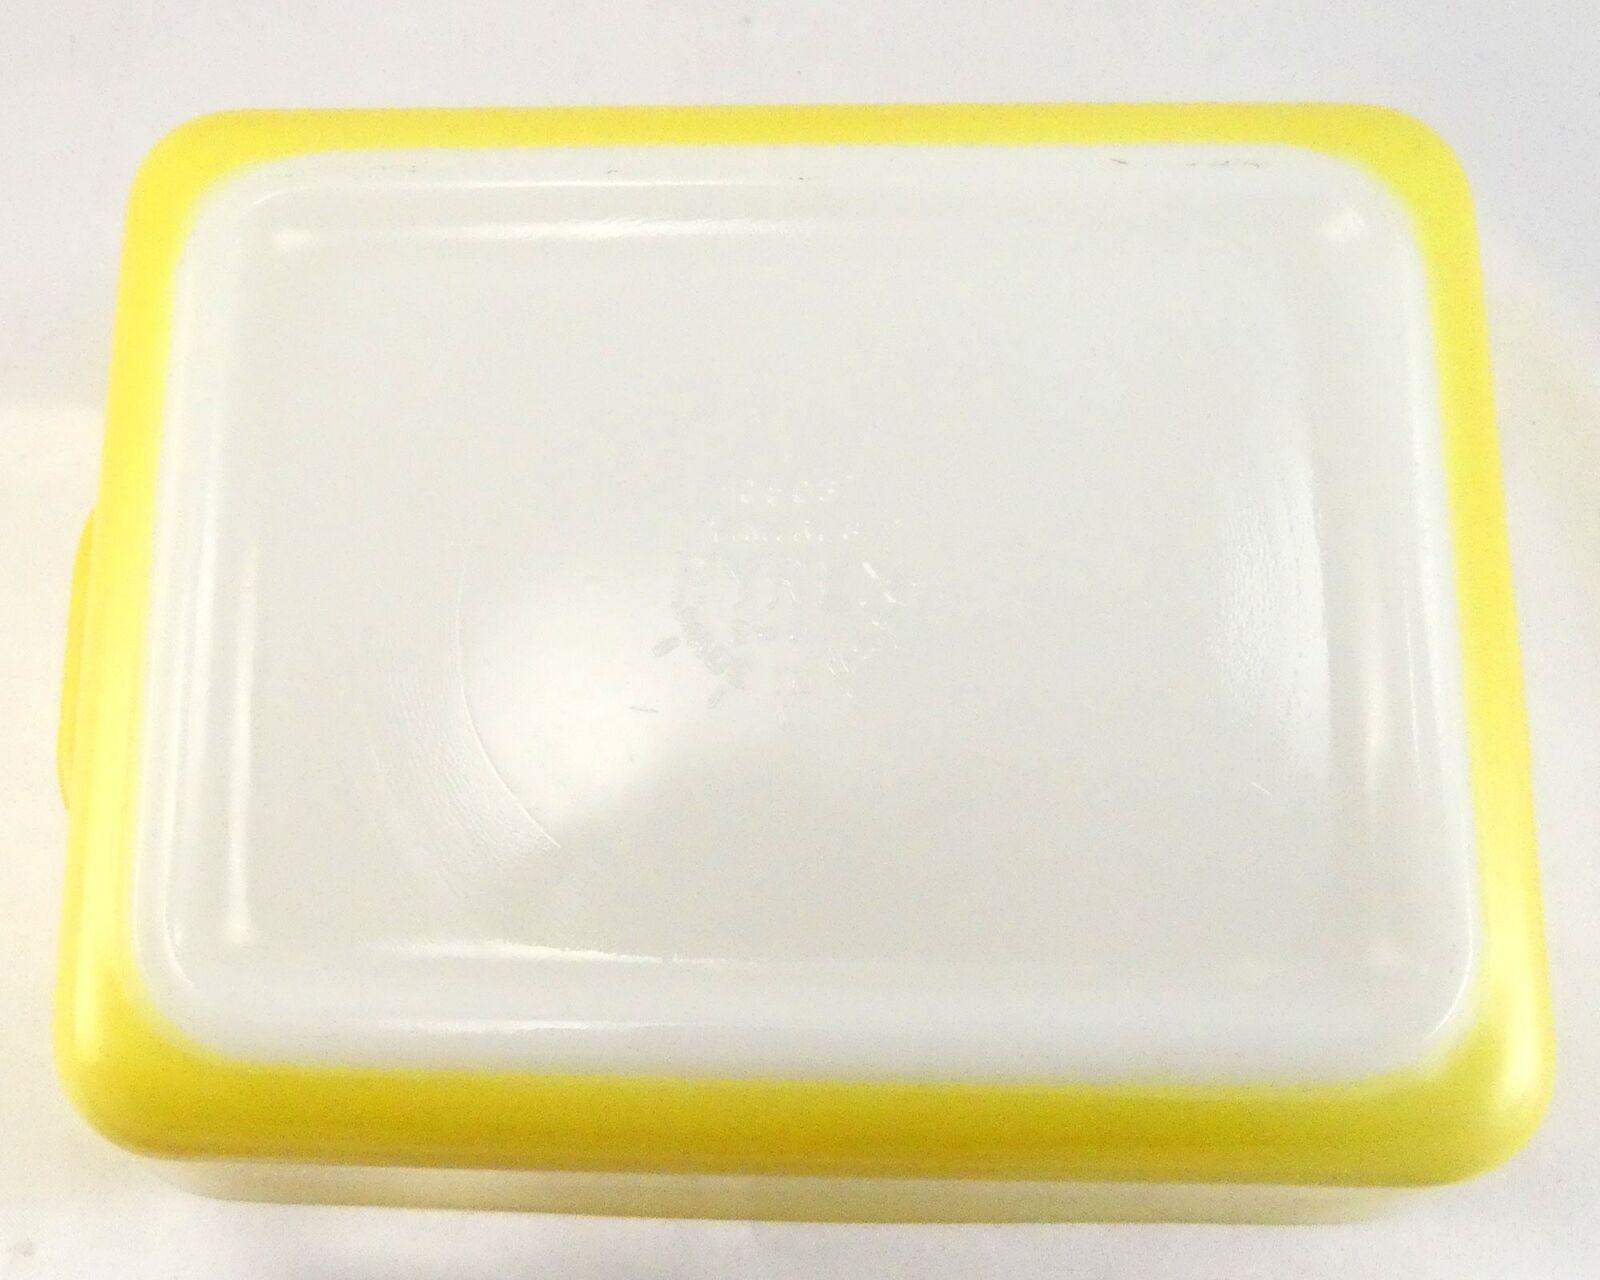 Pyrex 503 Banana Yellow Fridge Dish Milk Glass w/ Lid Made in the USA image 10